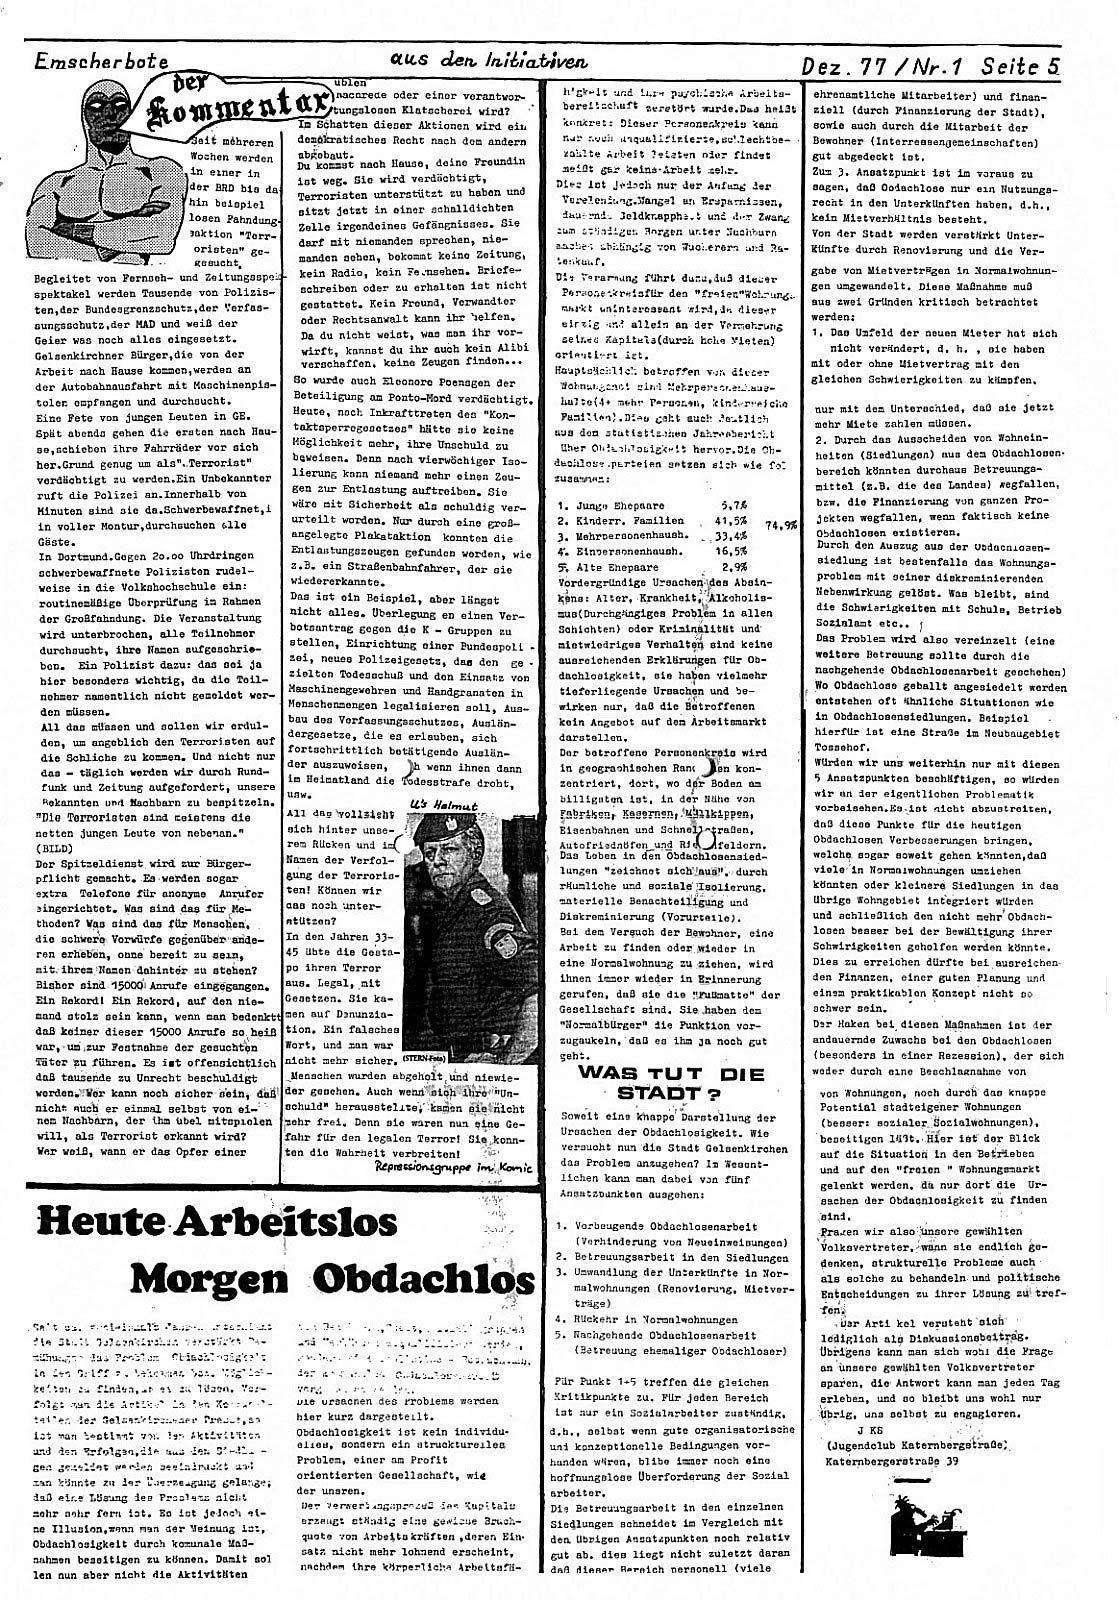 Gelsenkirchen_Emscherbote_1977_01_05